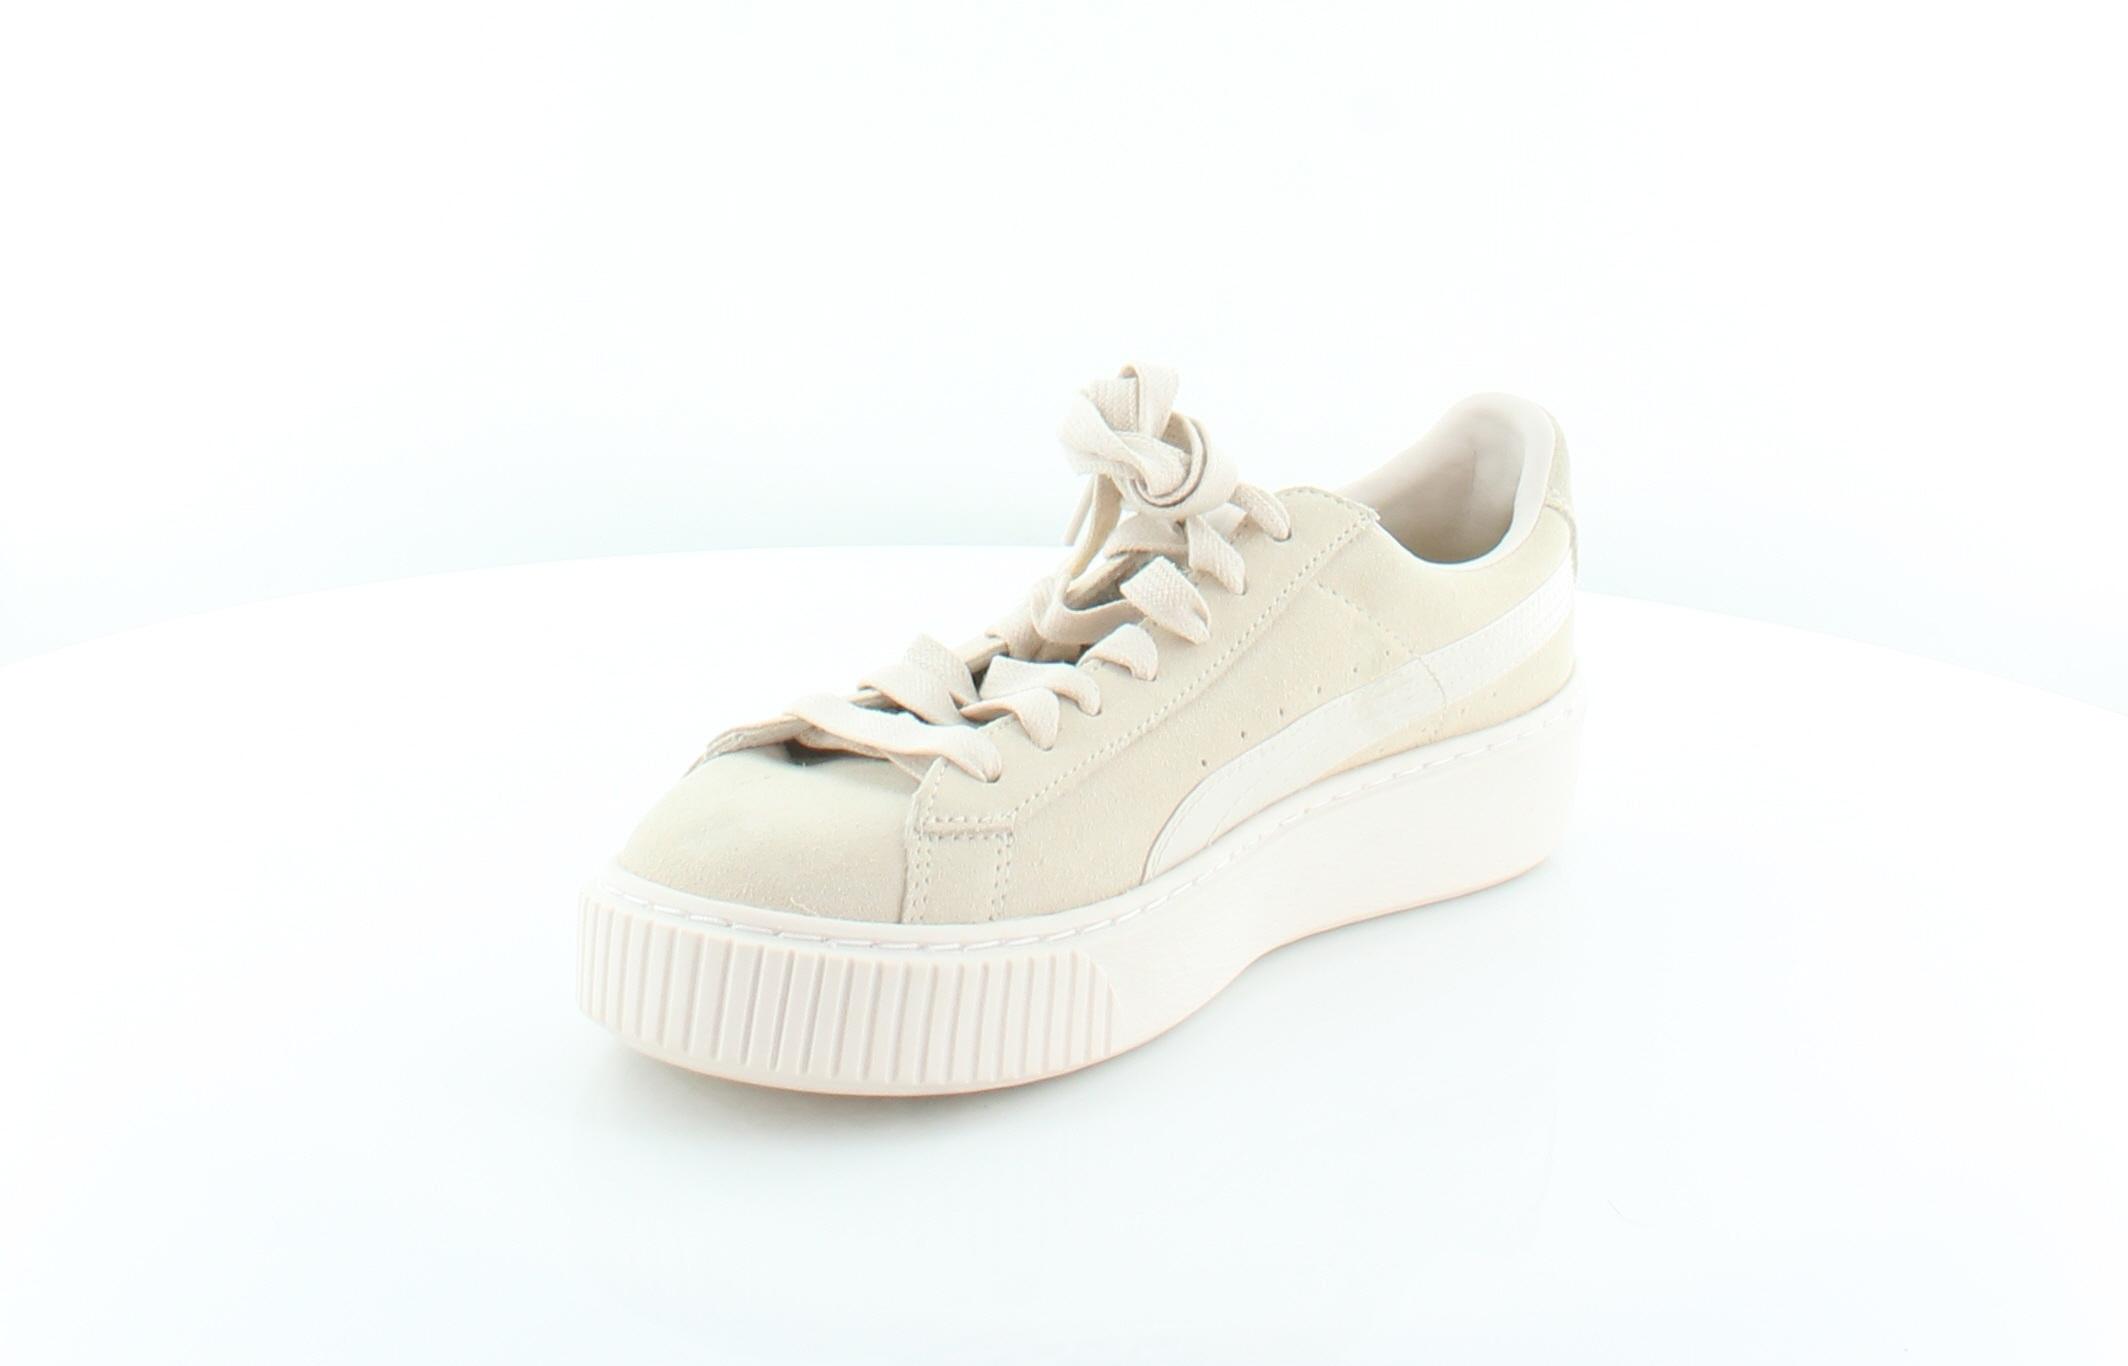 83fbb73b084485 Puma New Basket Platform Beige Womens Shoes Size 8 M Fashion ...